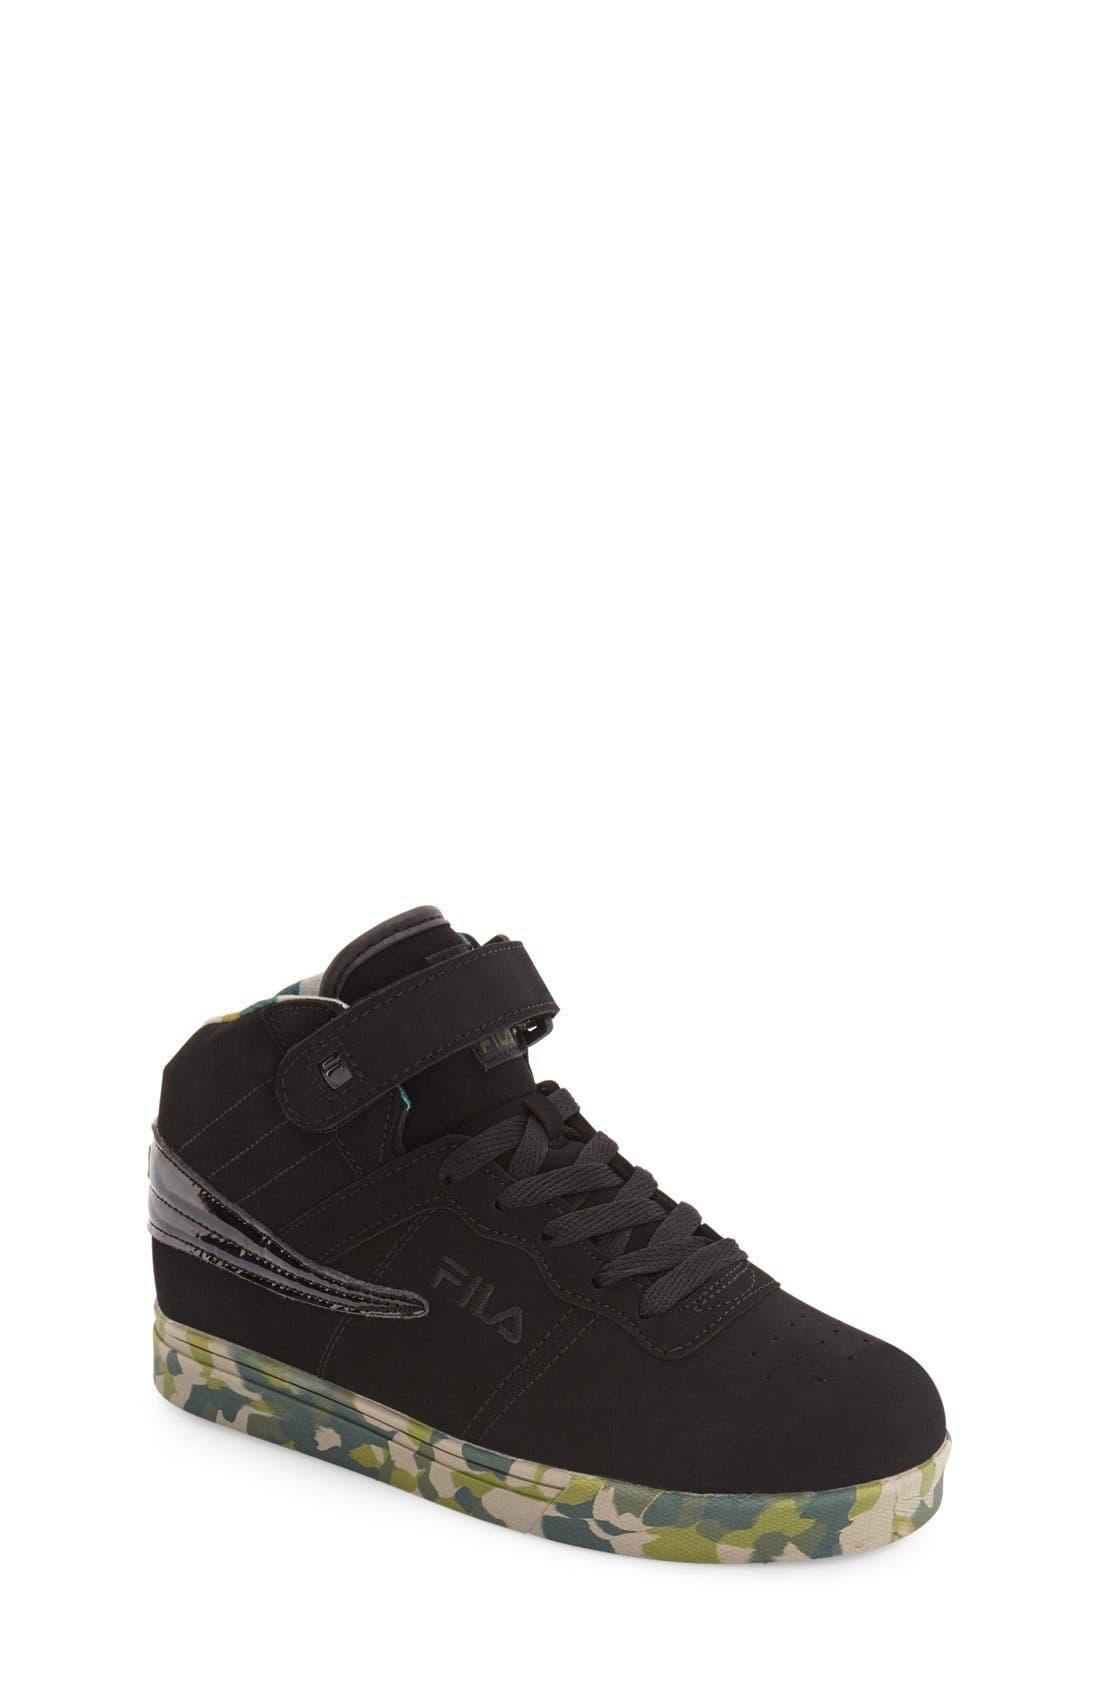 Vulc 13 Mashup High Top Sneaker,                             Main thumbnail 1, color,                             001